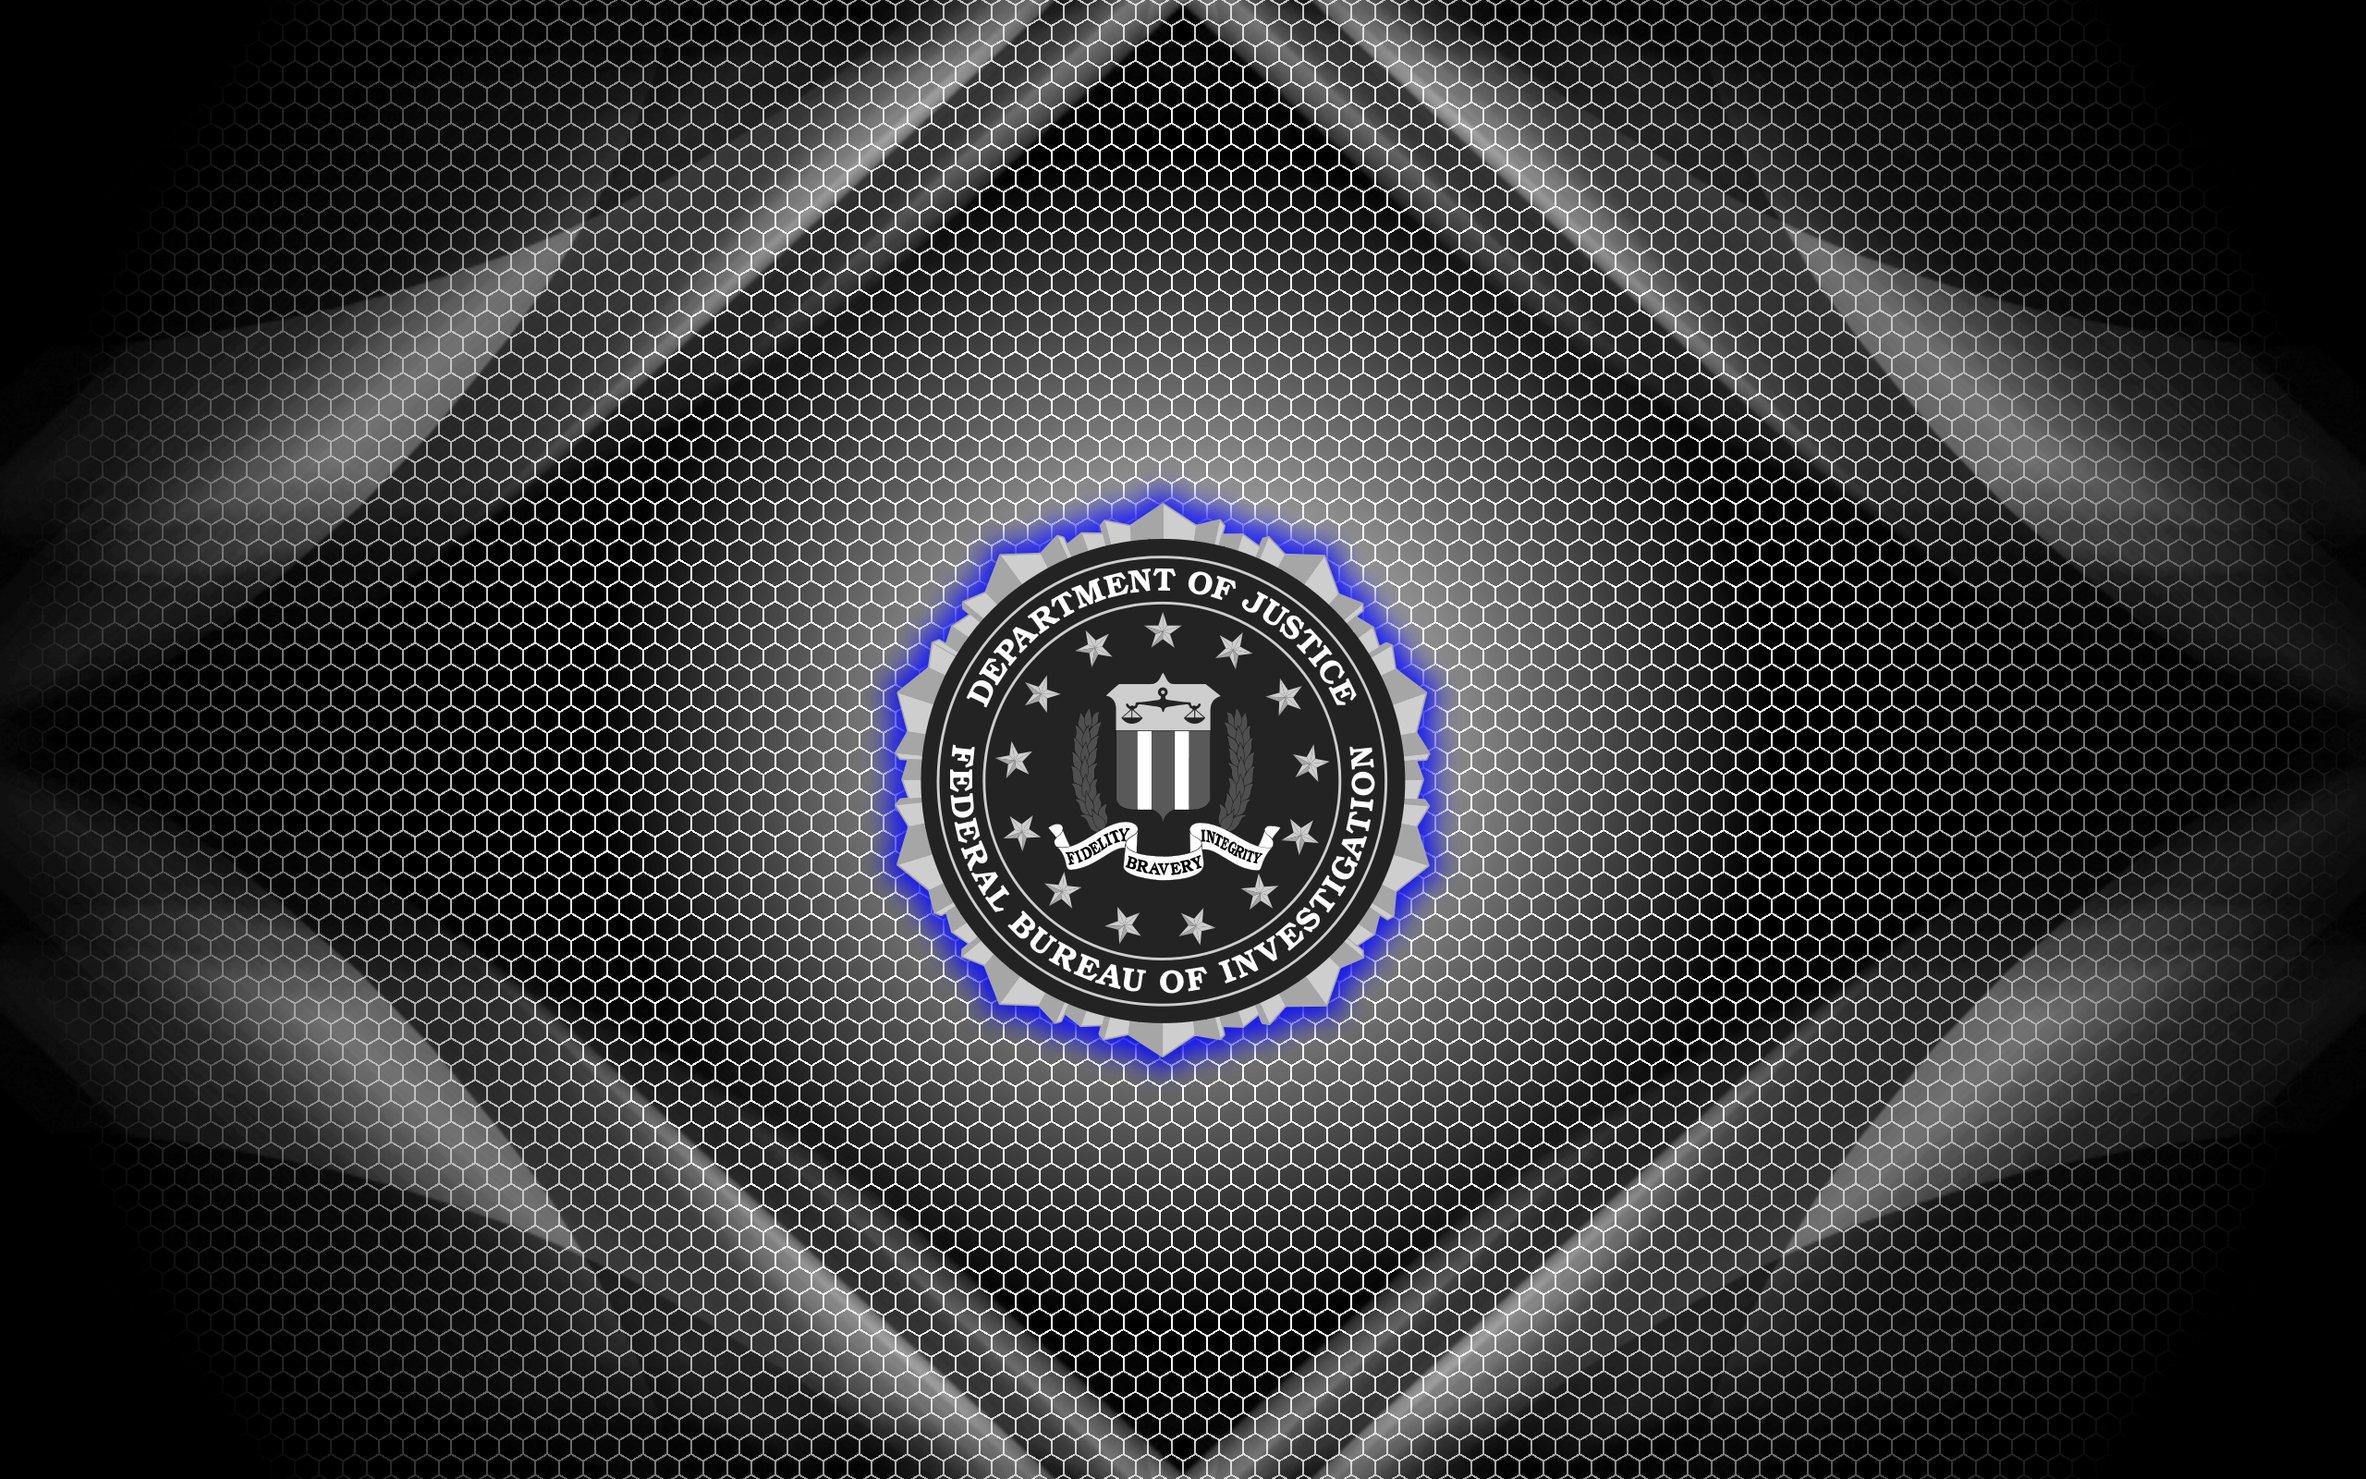 Hd Wallpapers Fbi Warnings Logos Blues 1366 X 768 151 Kb Jpeg 2366x1479